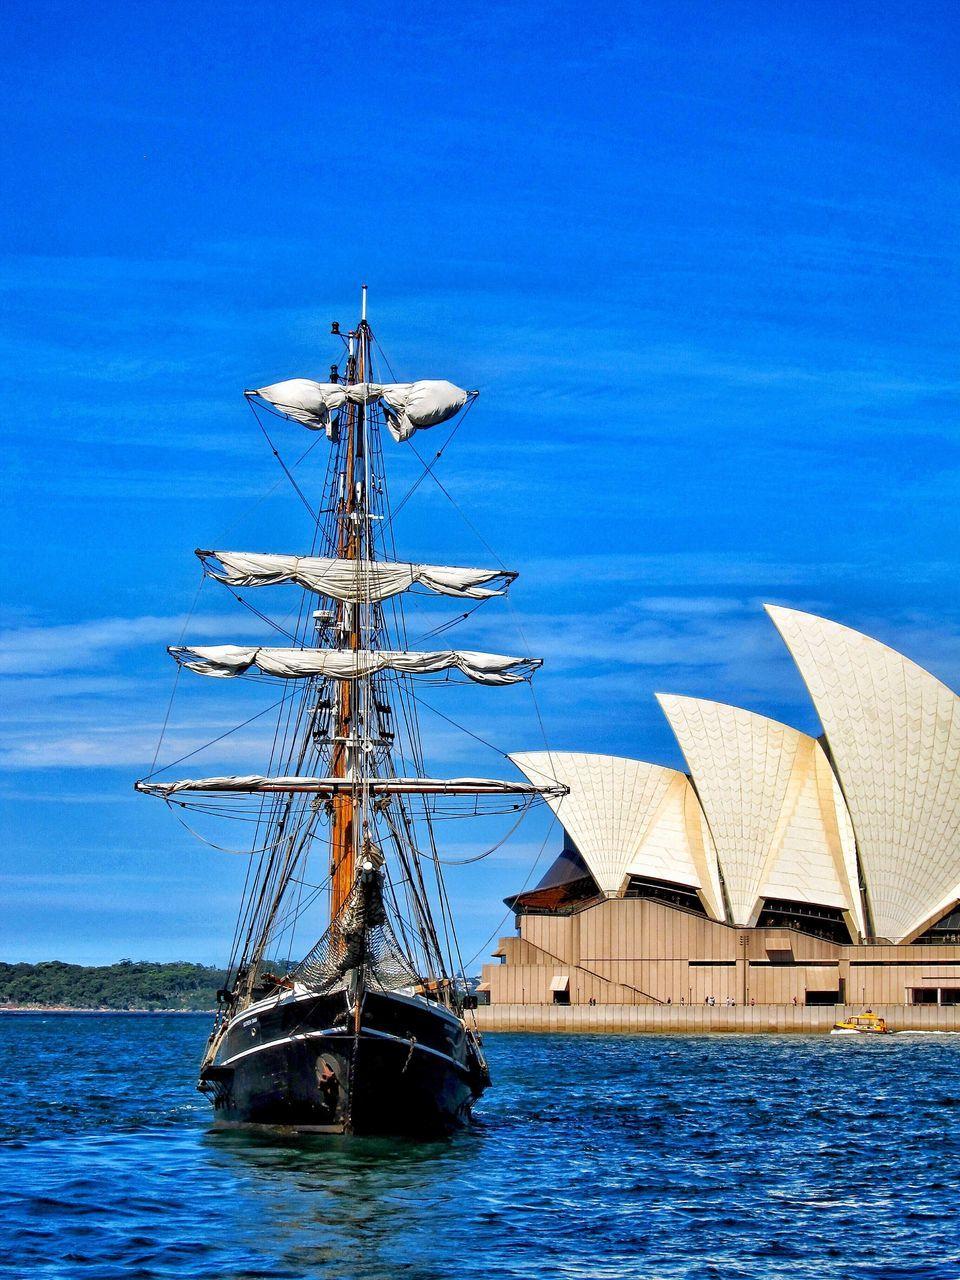 nautical vessel, outdoors, blue, transportation, day, no people, water, sailboat, sea, harbor, sky, mast, nature, tall ship